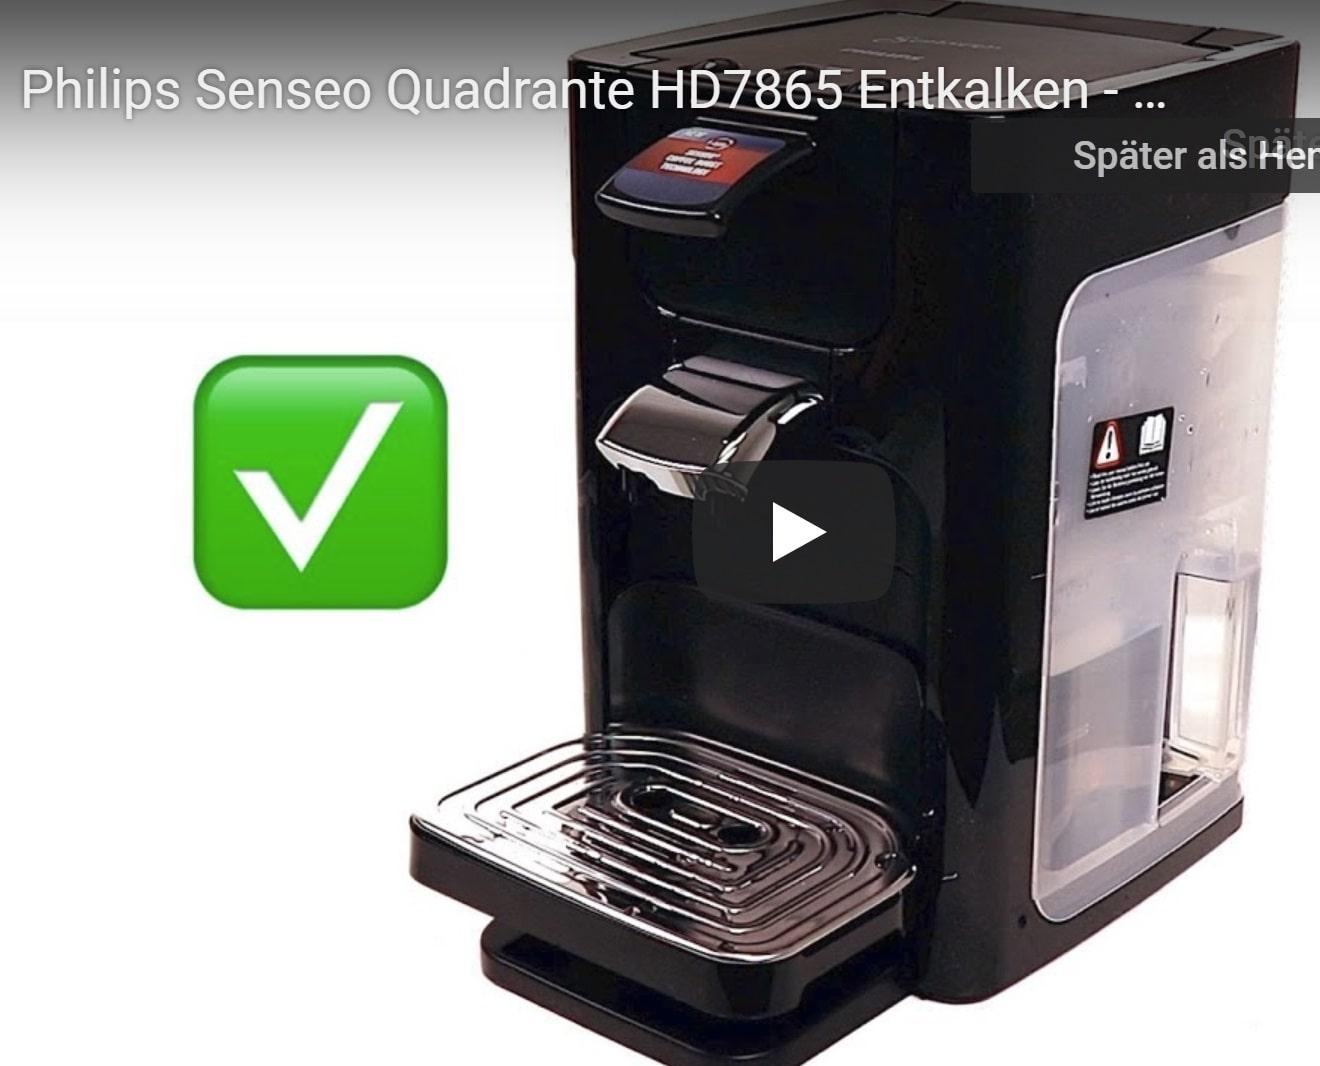 Philips Senseo Quadrante HD7865 richtig entkalken